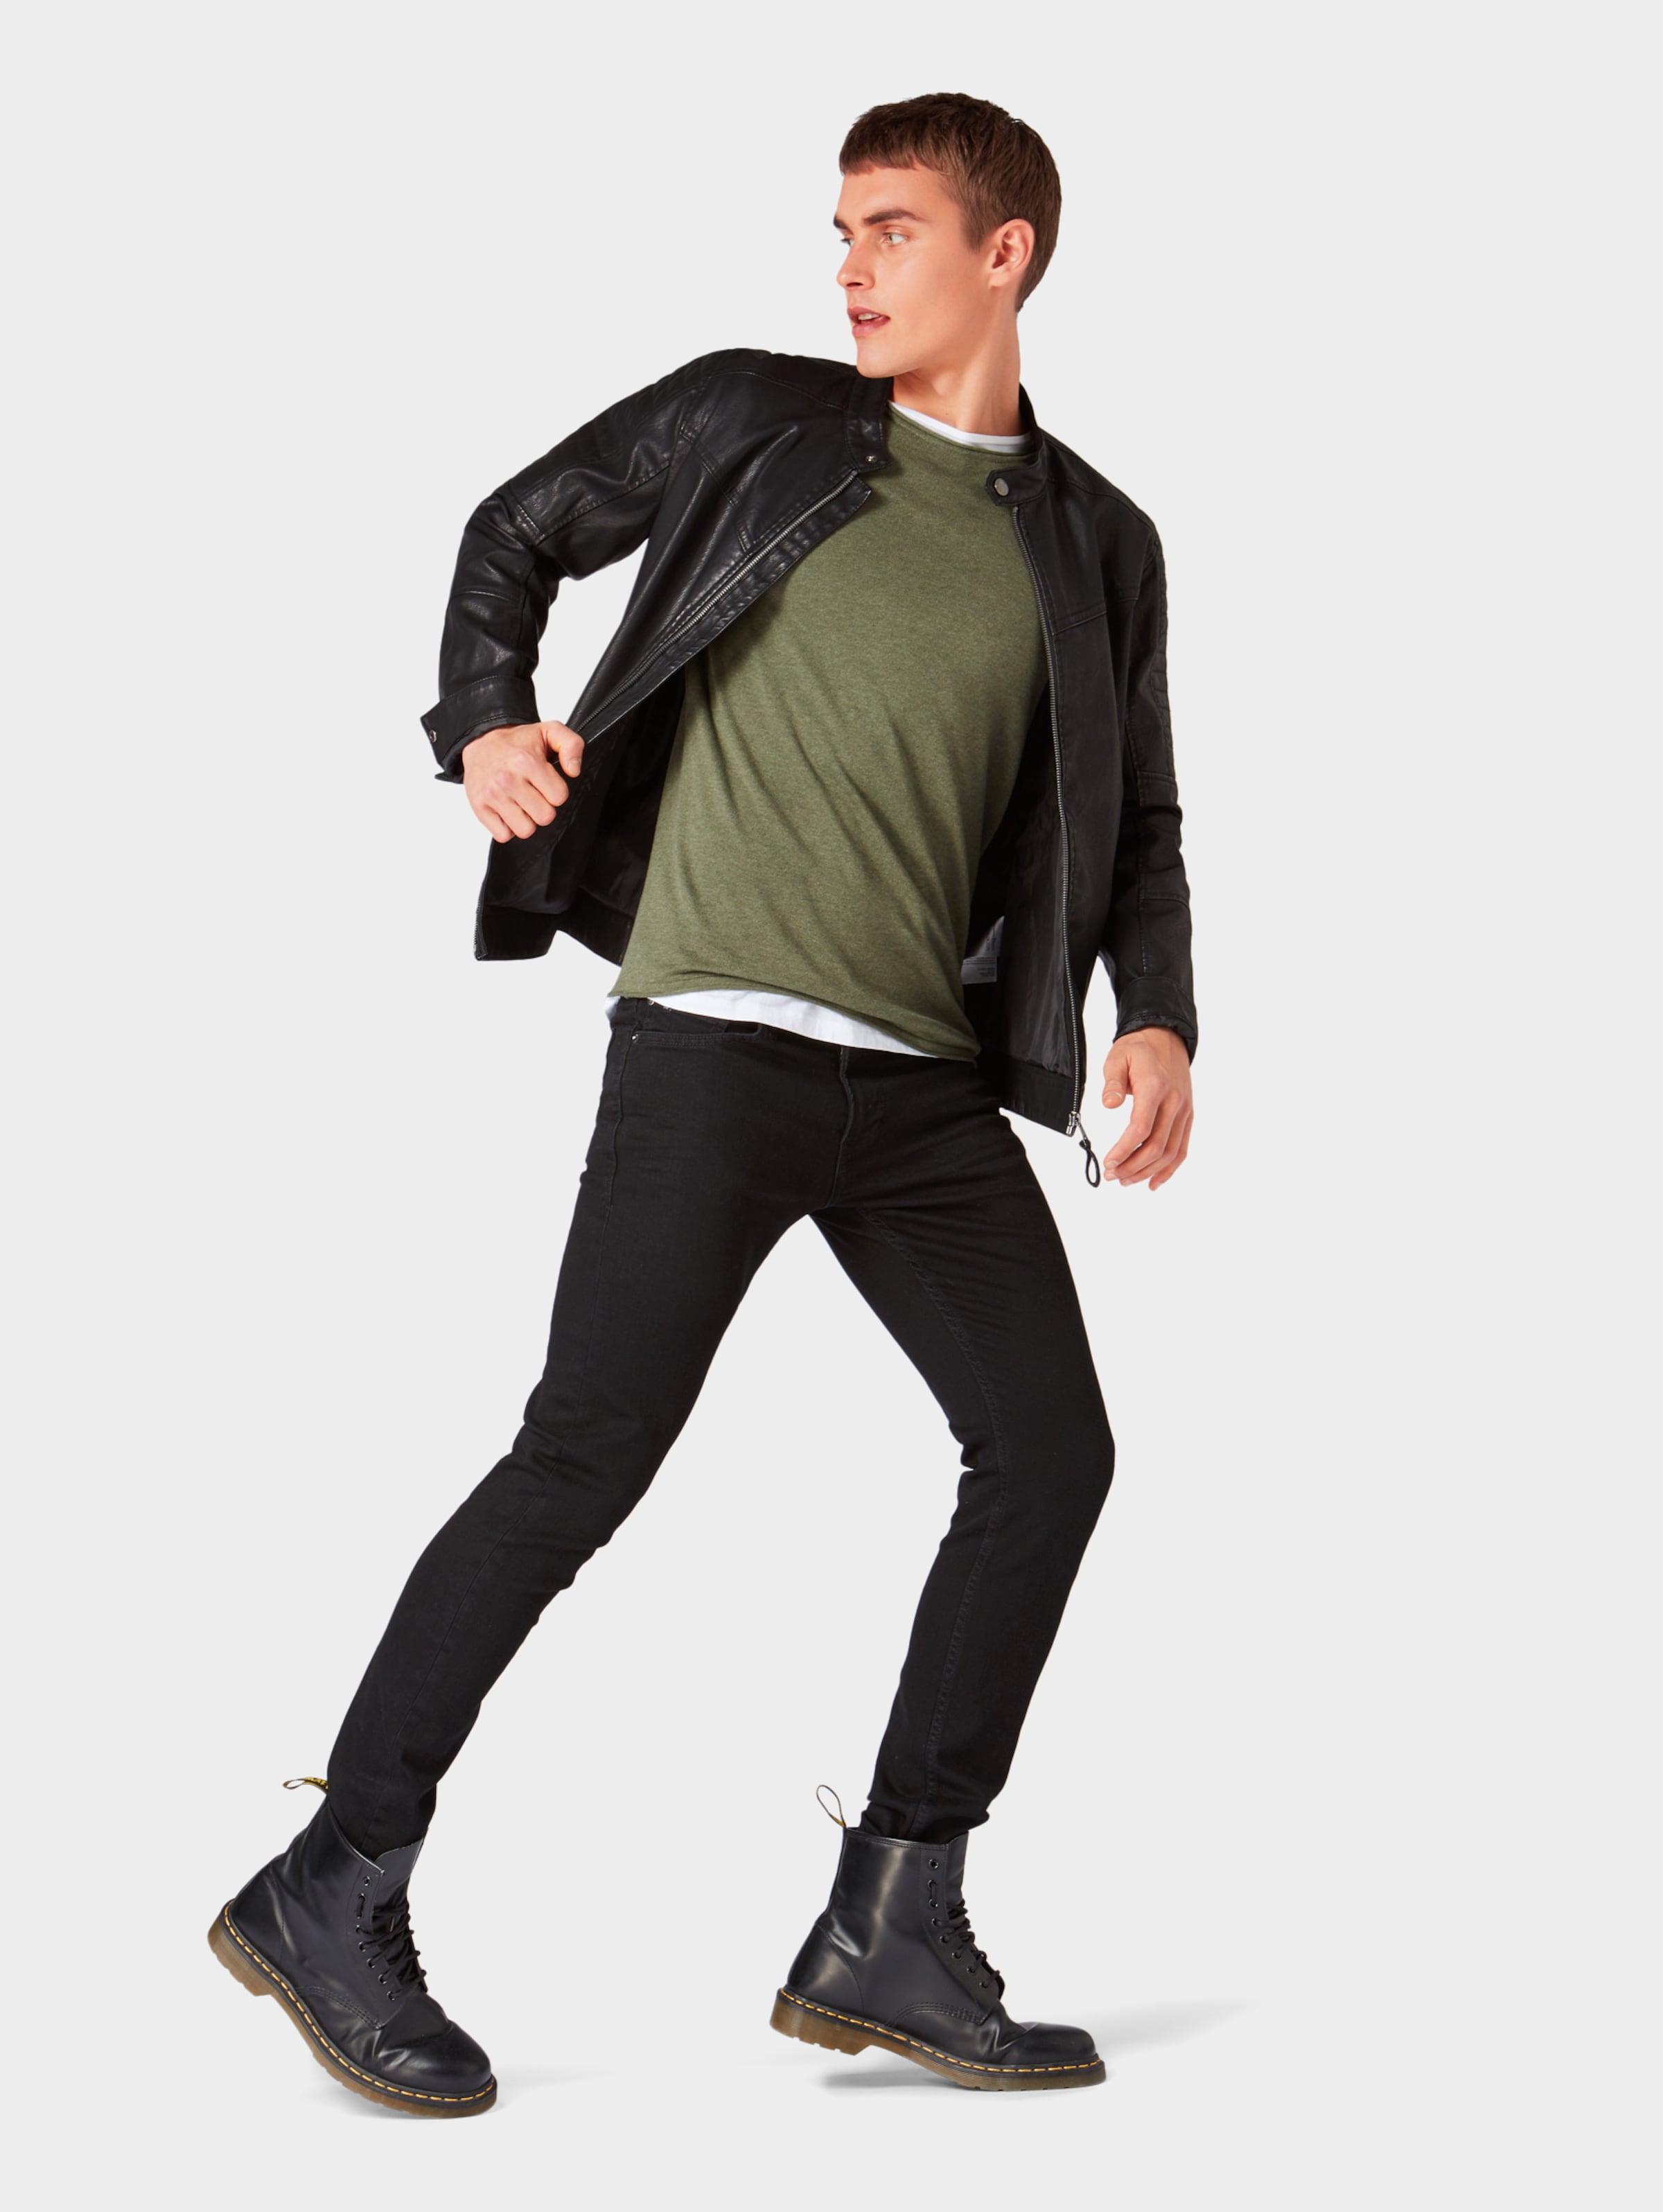 Tailor In Khaki Denim Pullover Tom LVGSzqpUM